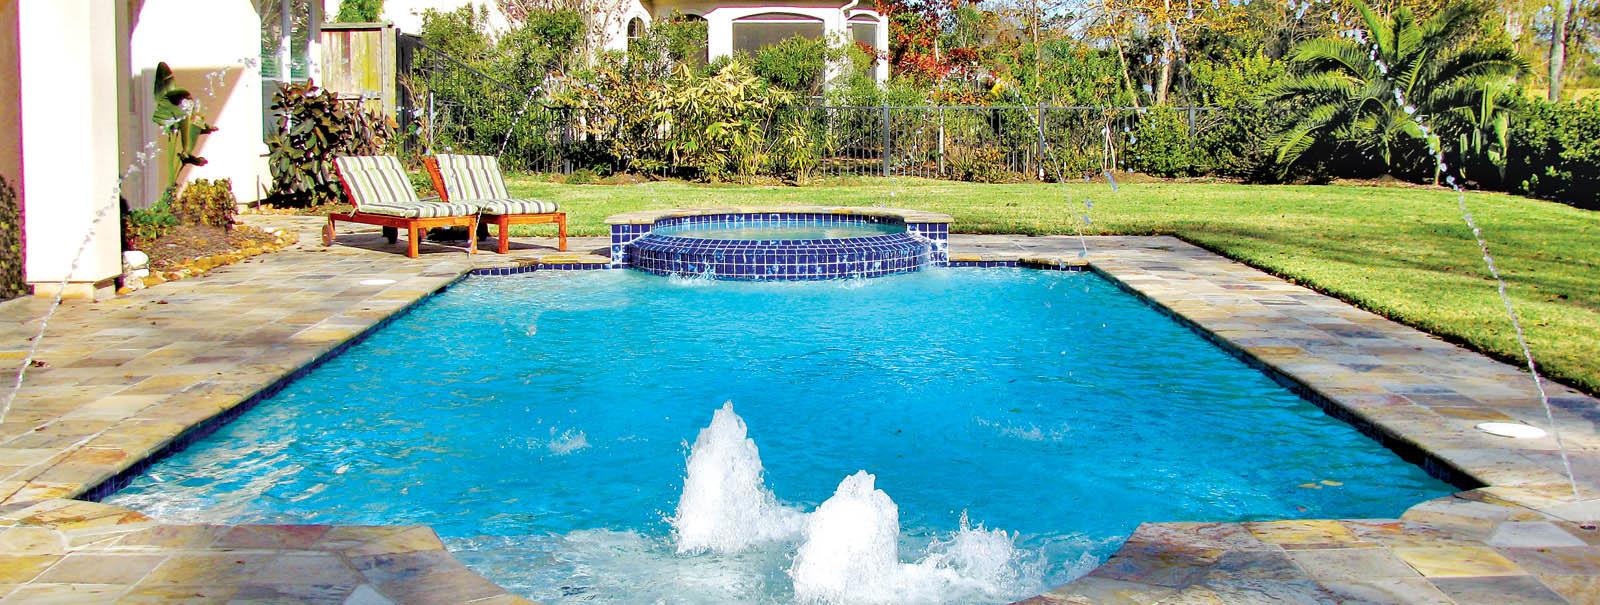 Houston Pool Renovations Houston Commercial Pool Builder